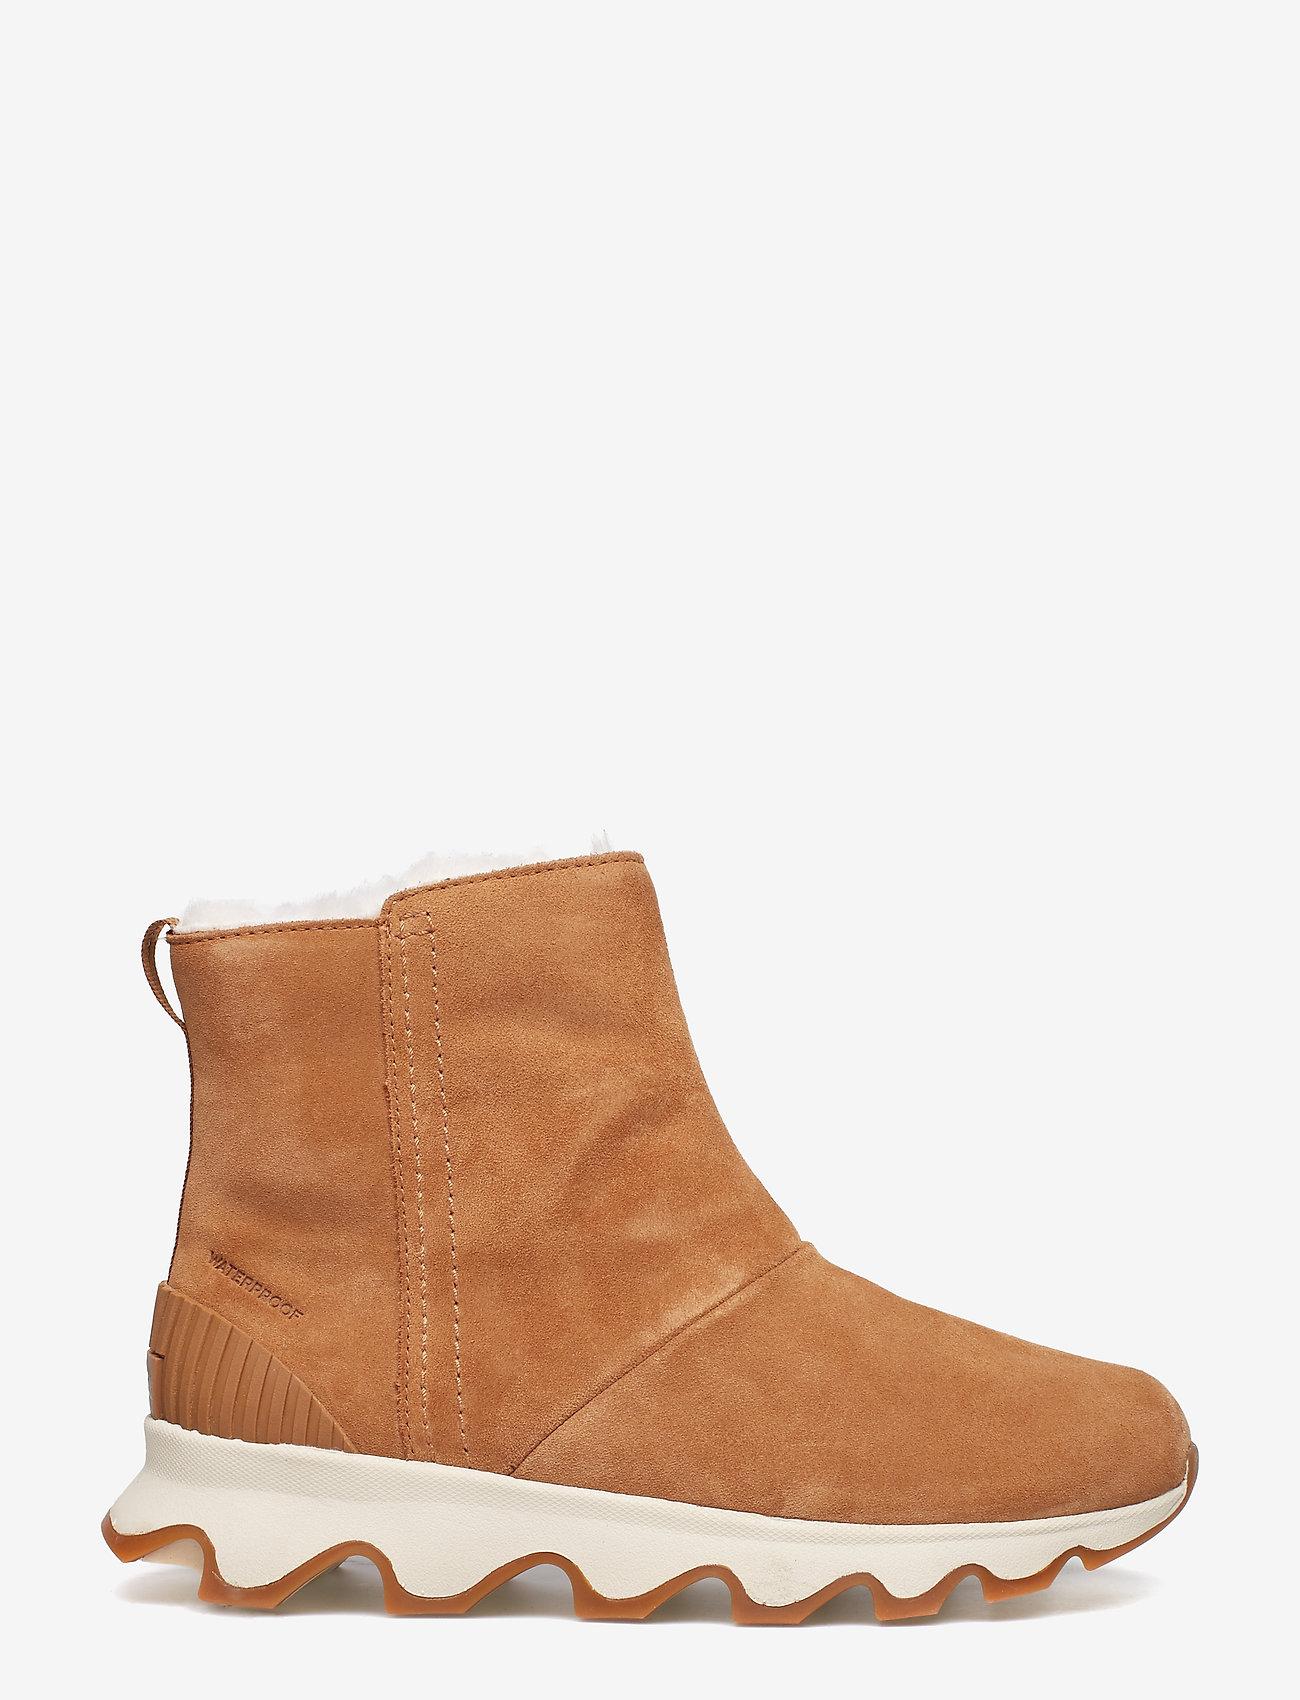 Sorel - KINETIC SHORT - platta ankelboots - camel brown